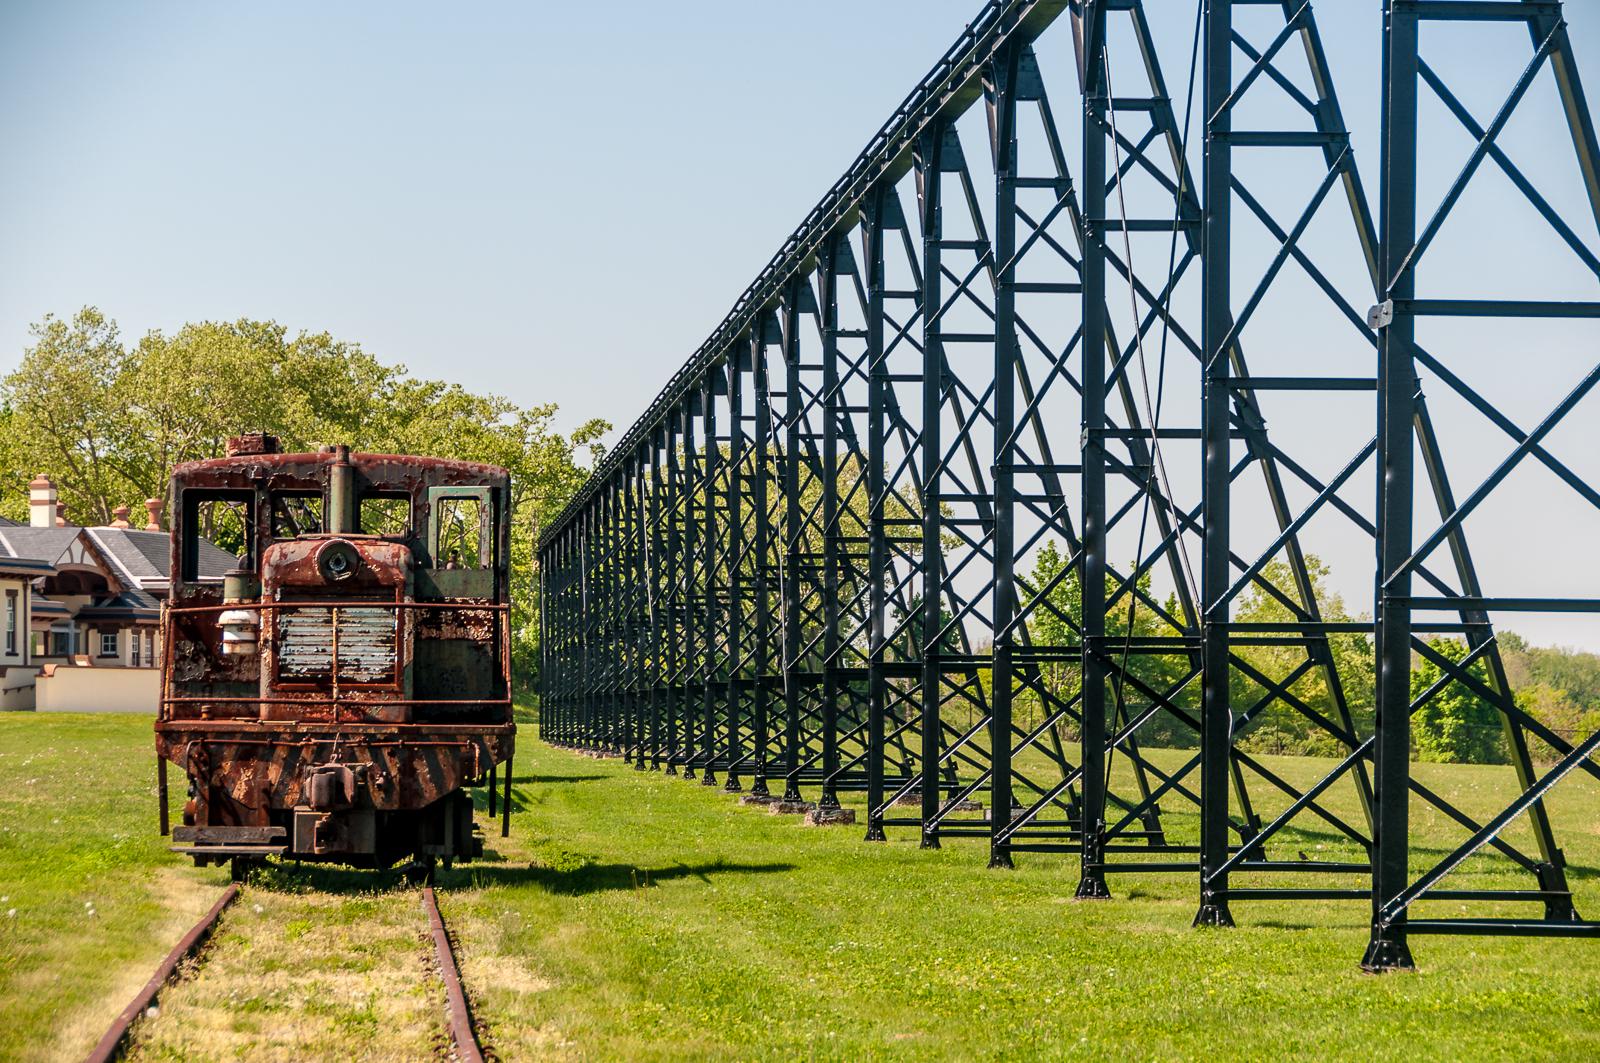 rust-train-roebling-7584